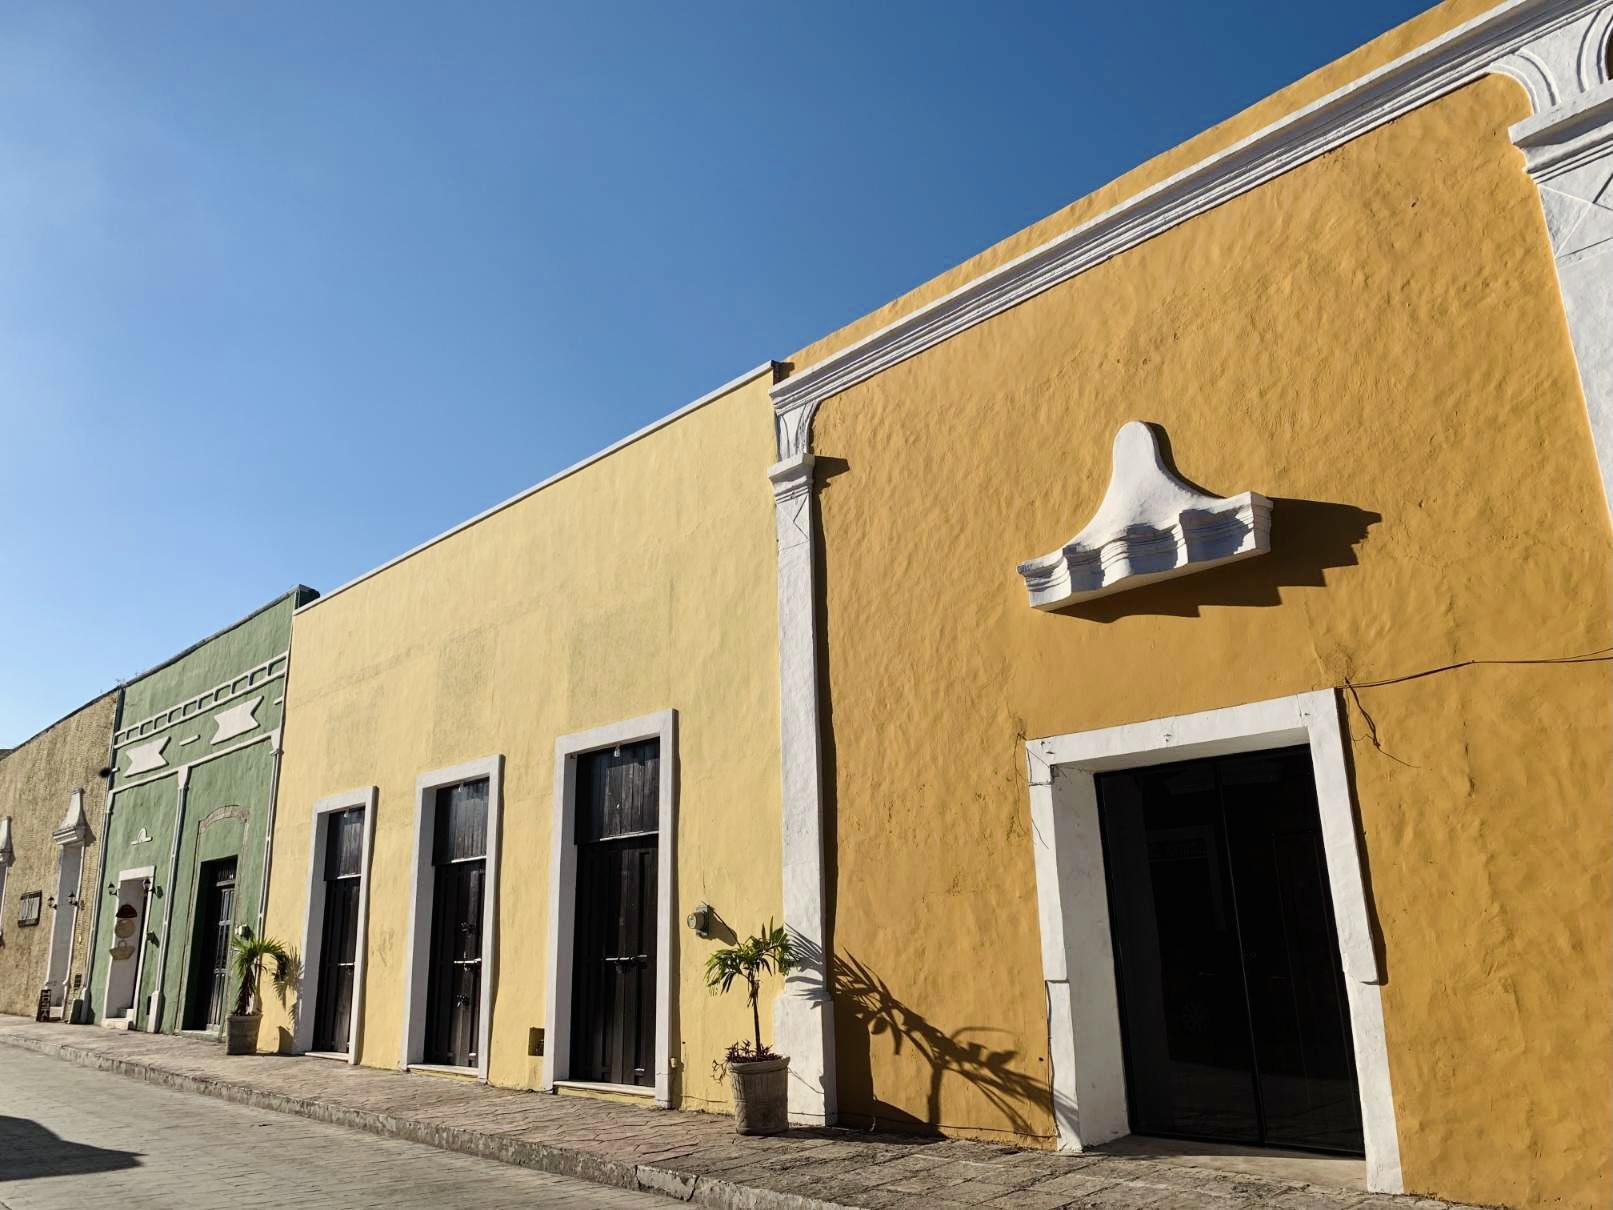 valladolid mexico hot weather